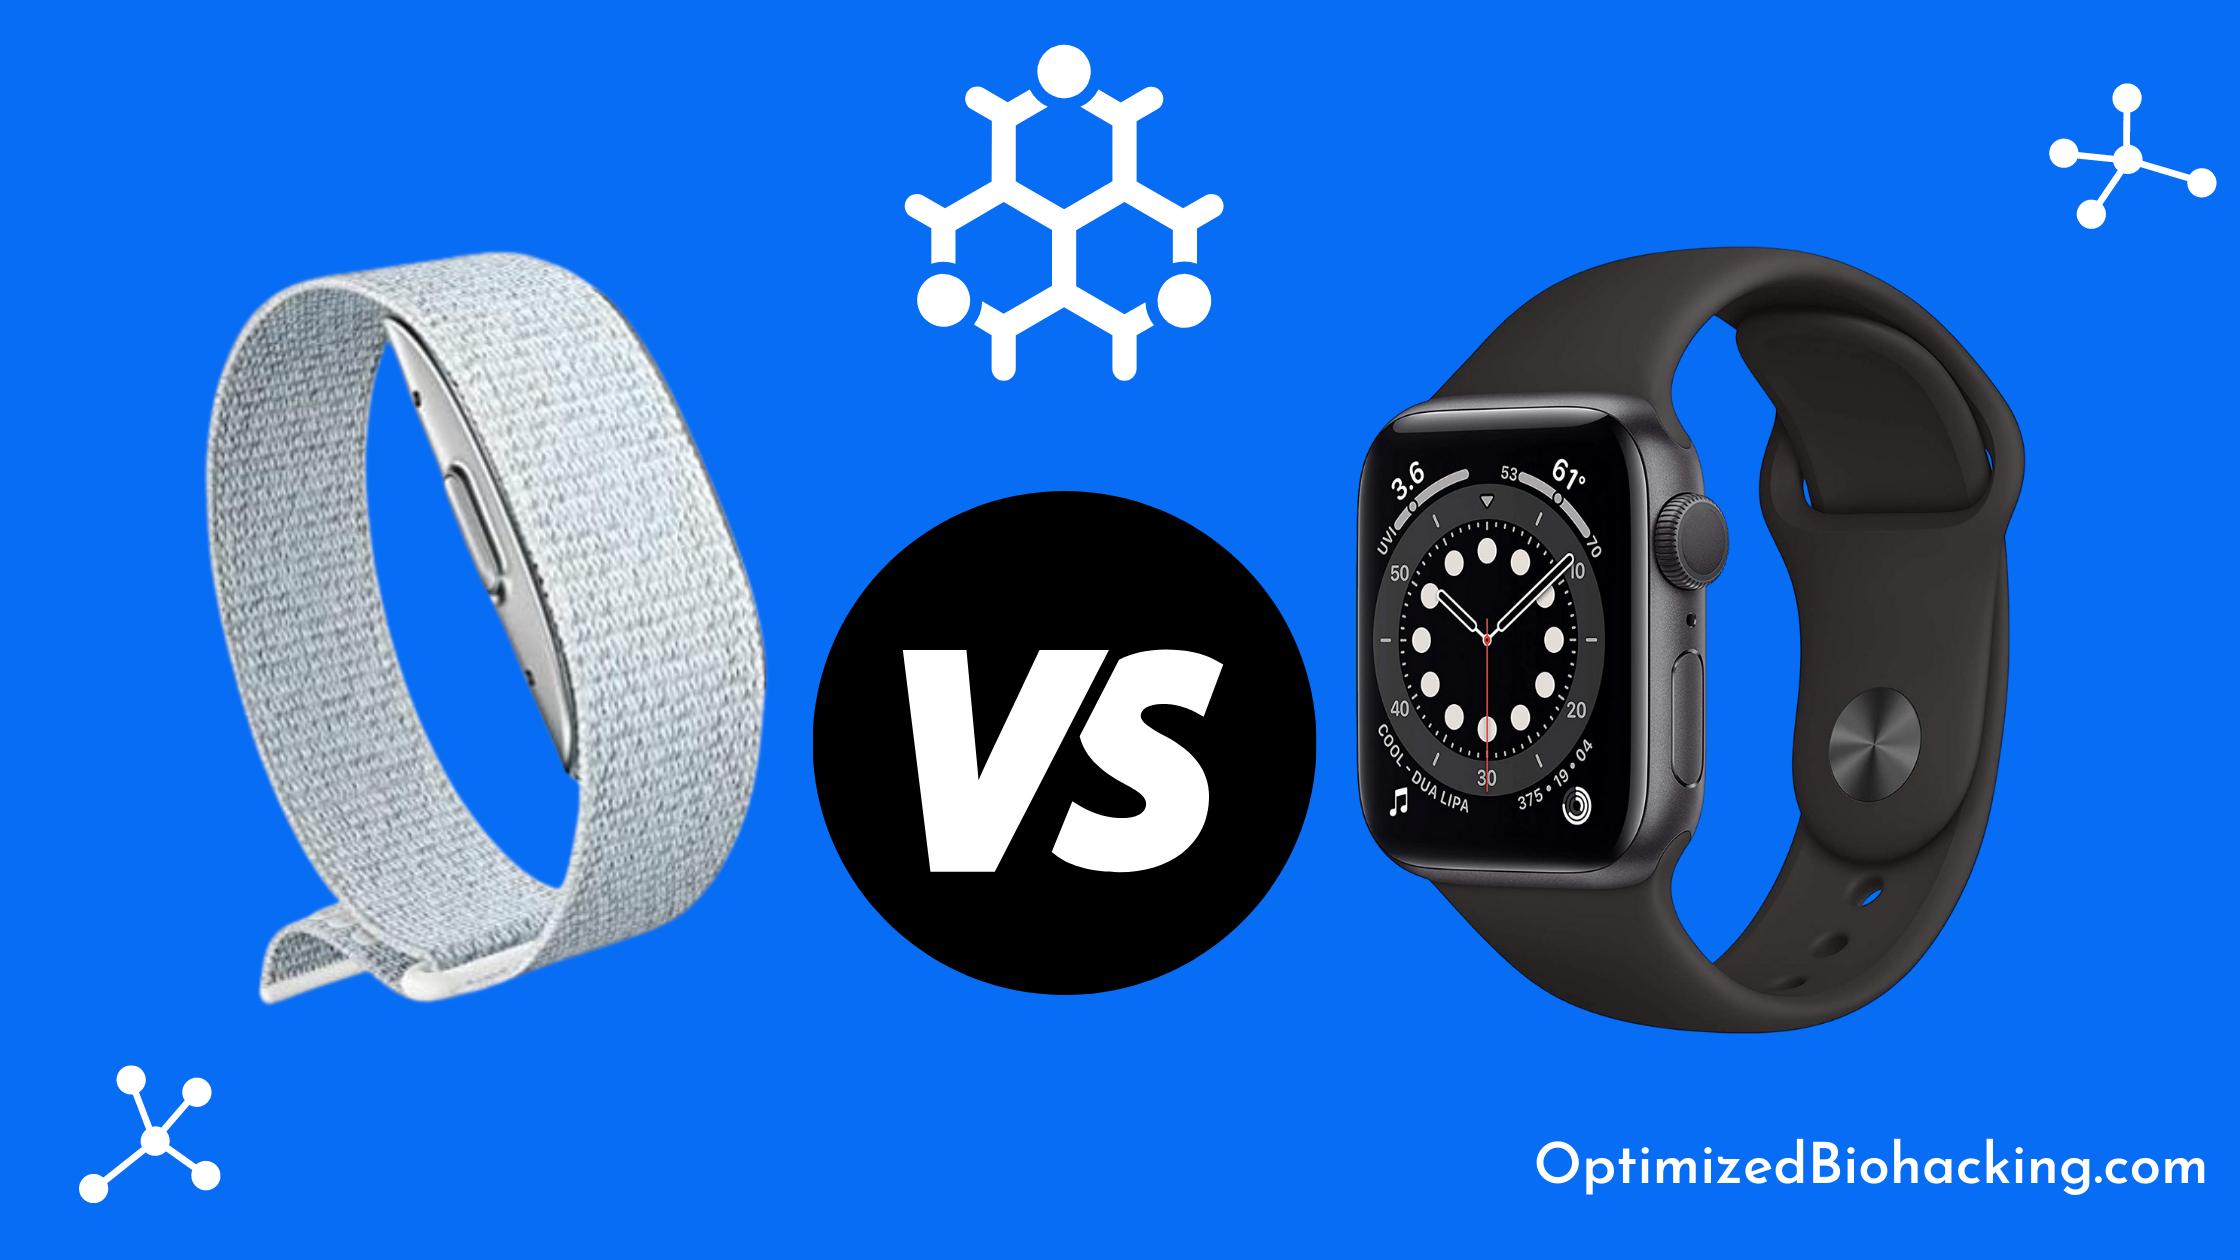 Amazon Halo Vs Apple Watch Apple Watch Fitness Tracker Wearable Halo Band